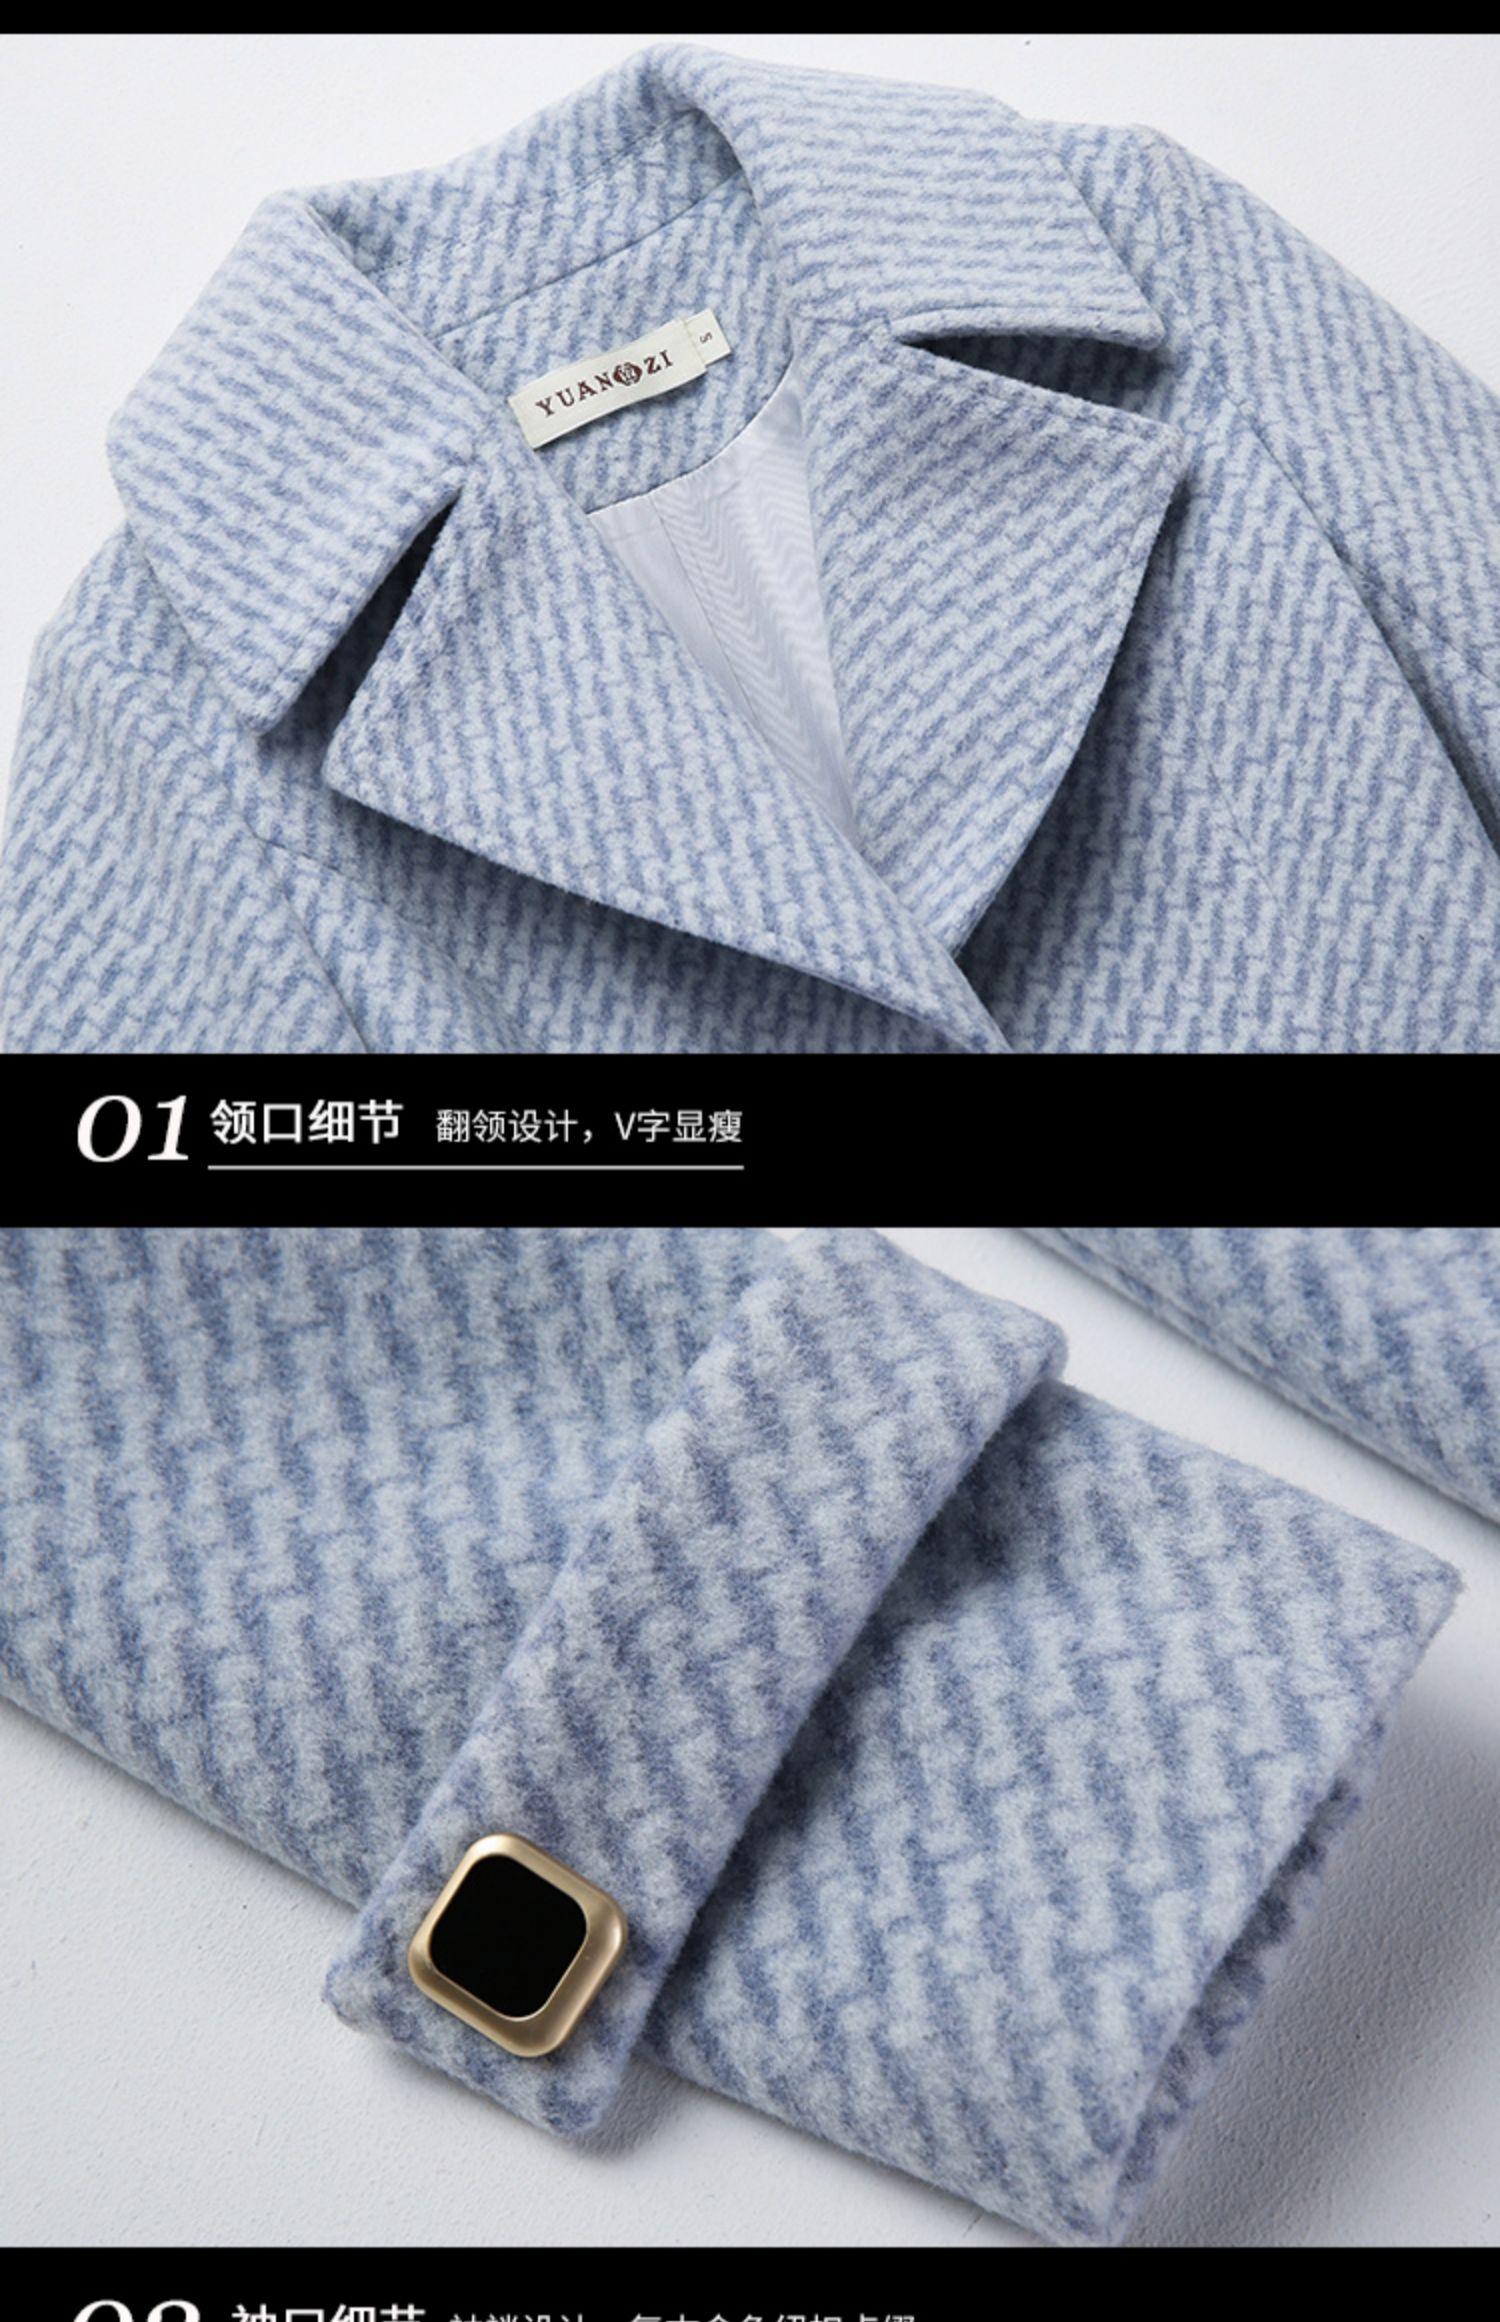 Novo casaco de lã de inverno das